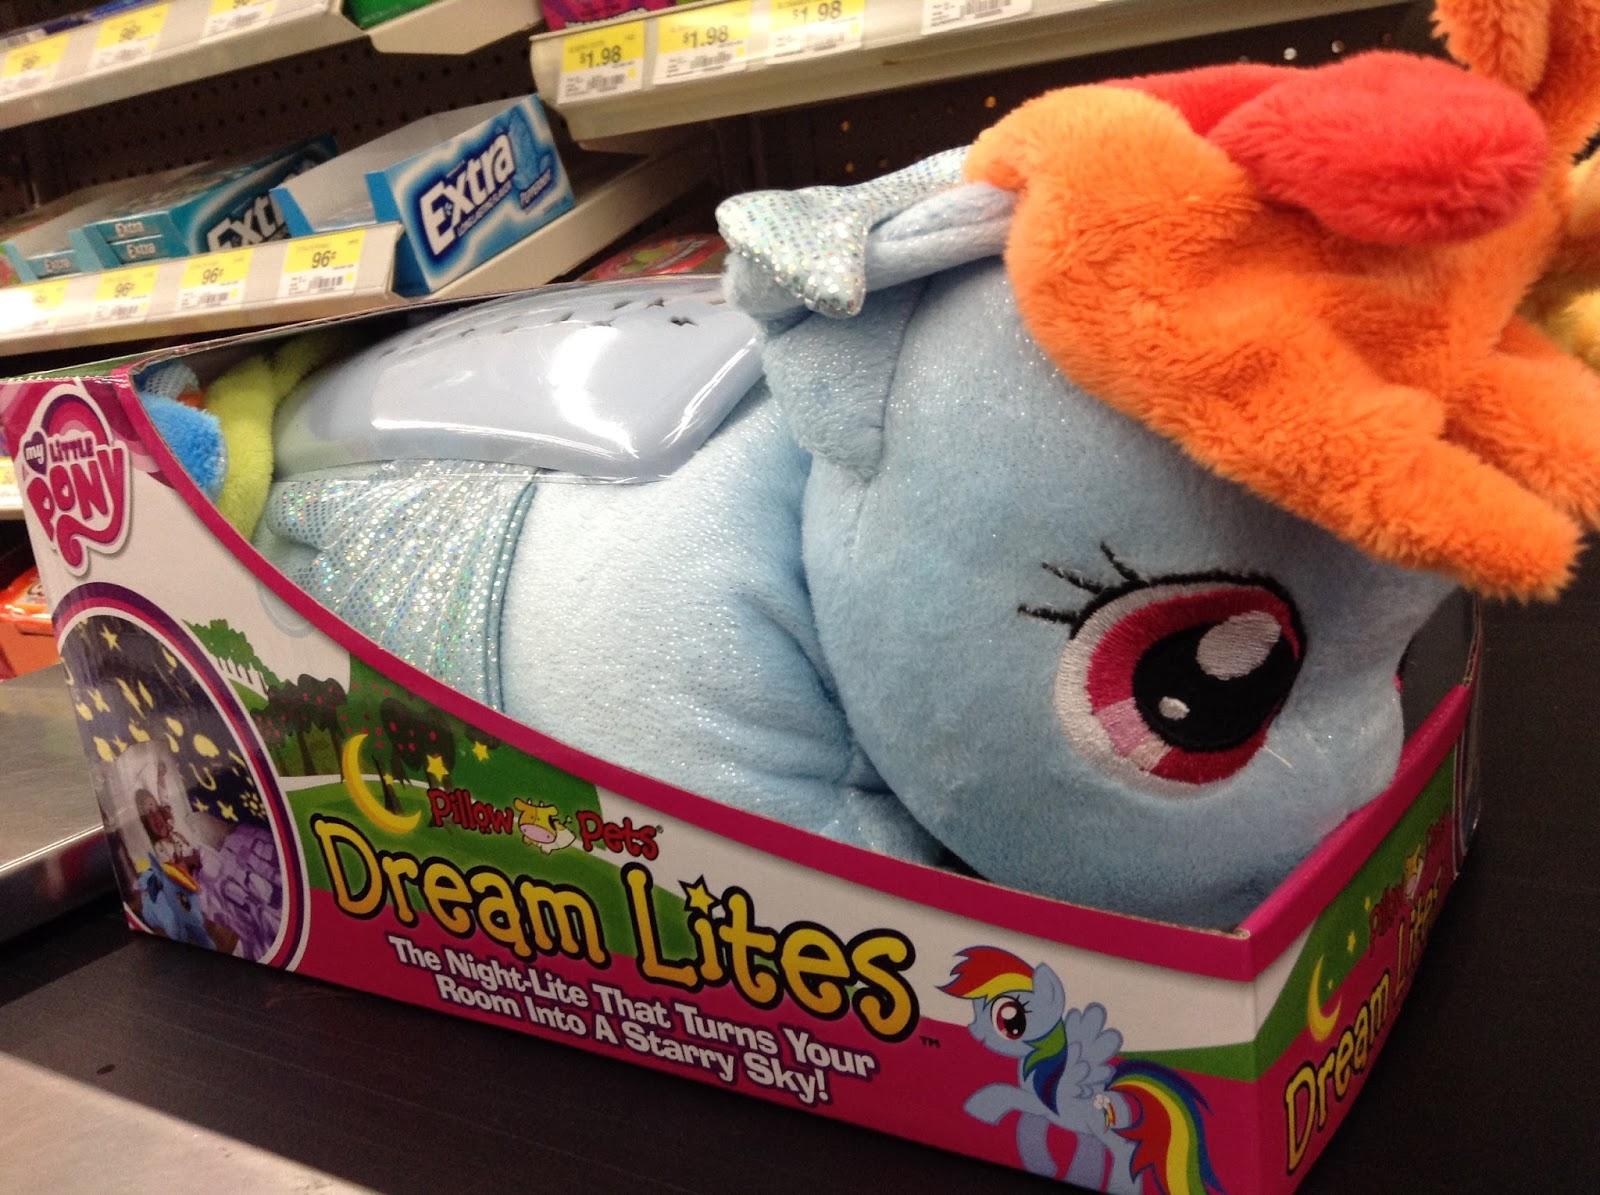 MLP Pillow Pets Dream Lites Found